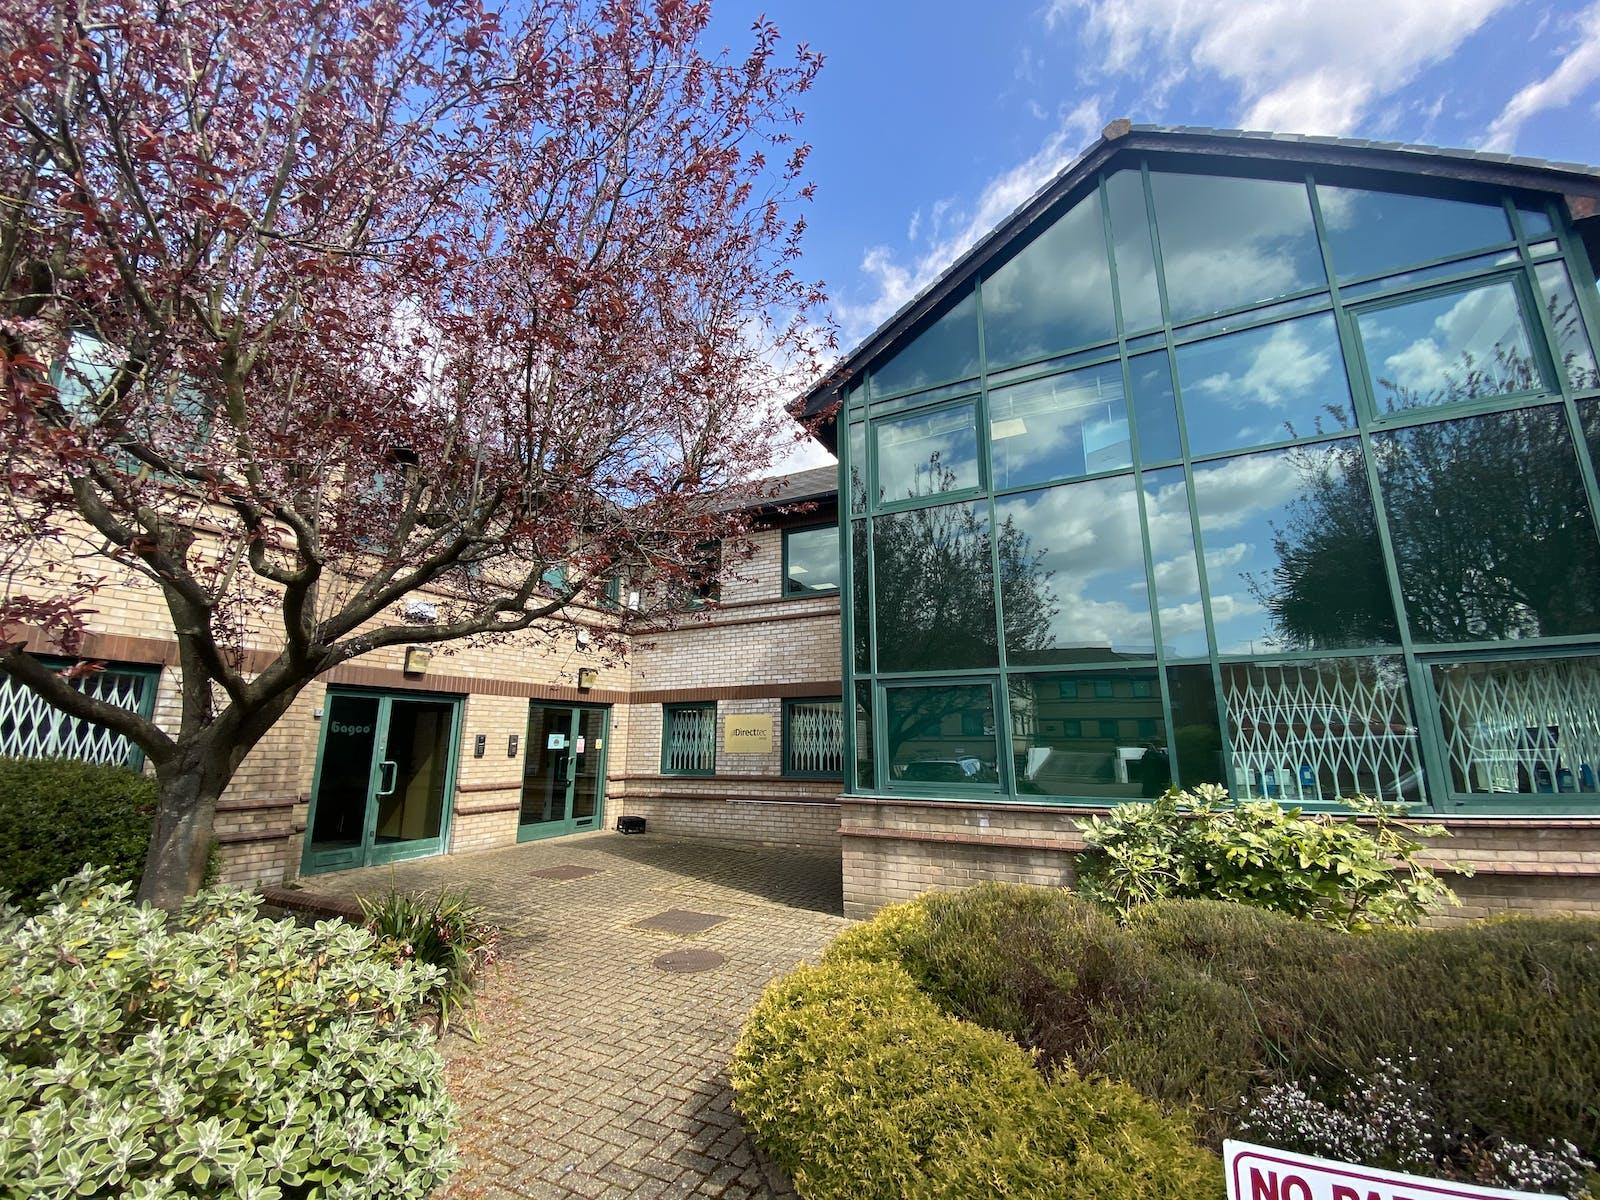 Unit 4, Churchill Court, Hortons Way, Westerham, Office For Sale - IMG_8709.jpeg